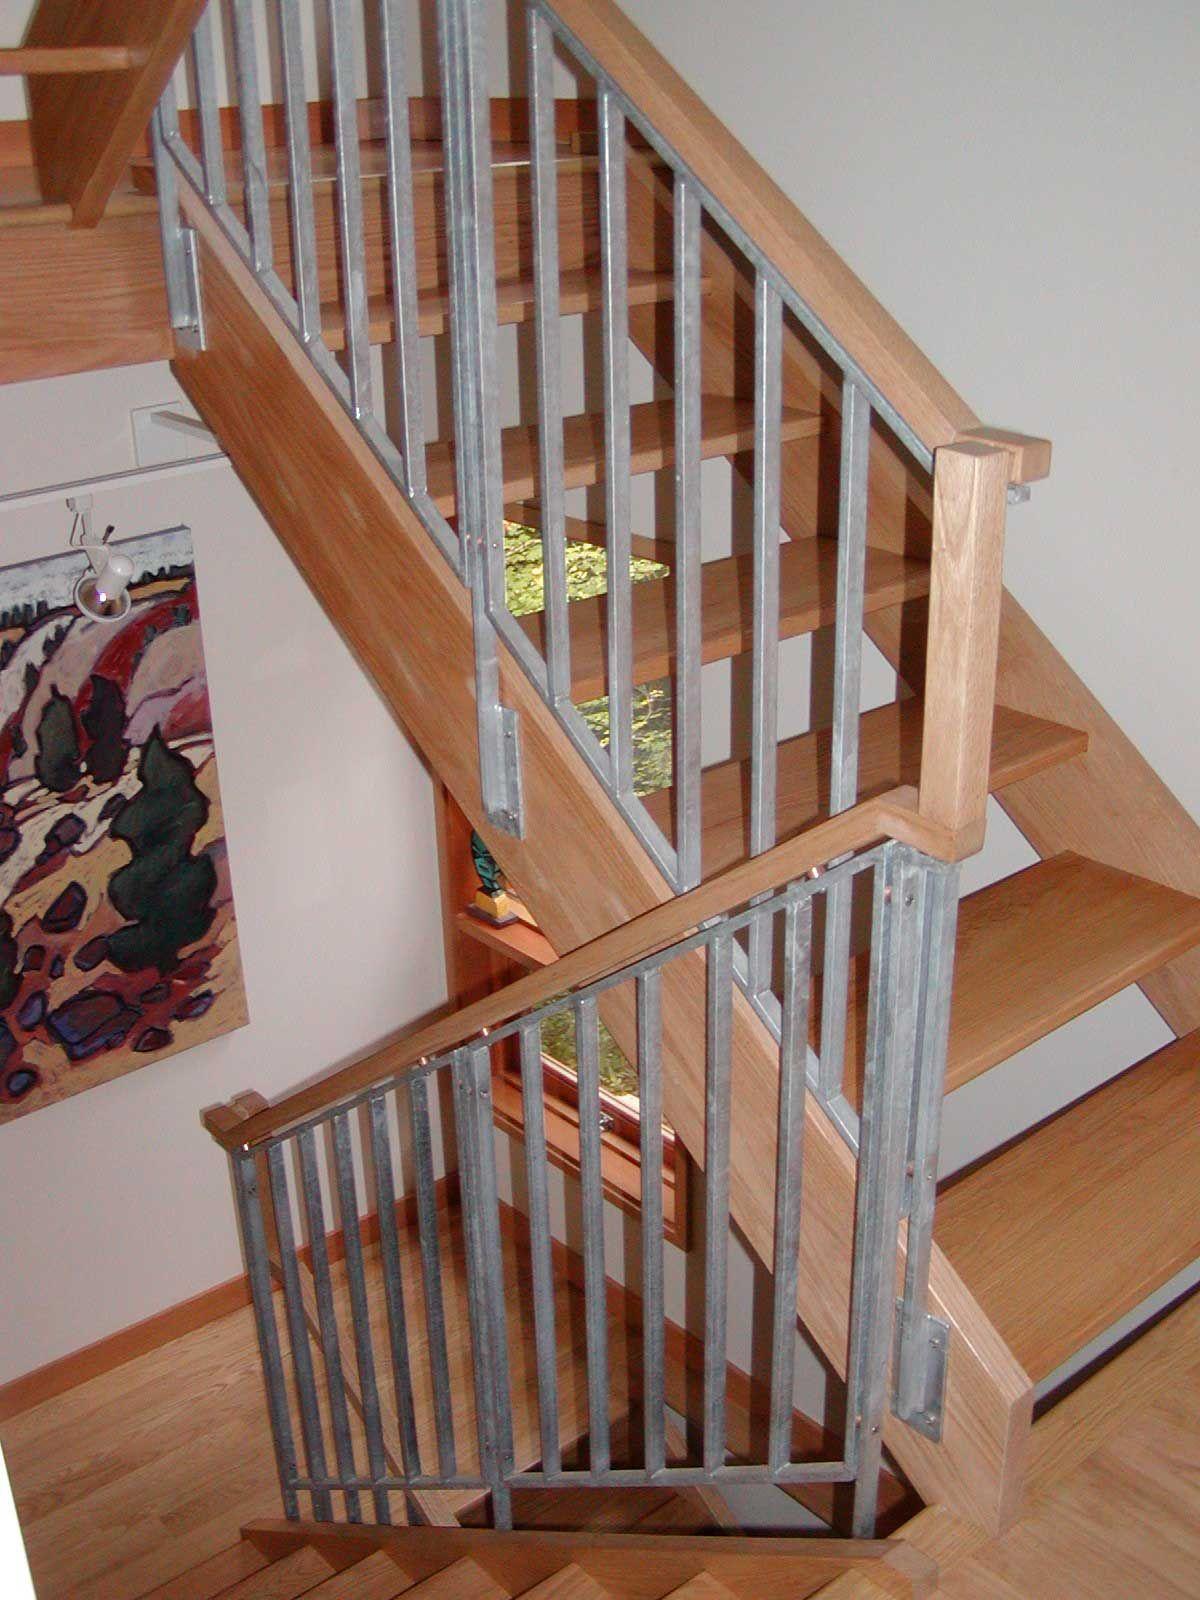 Wood Stair Railings Interior Kris Allen Daily Wooden Staircase   Wood Stair Railings Interior   Residential   Craftsman Style   2Nd Floor   Paint   Rosette